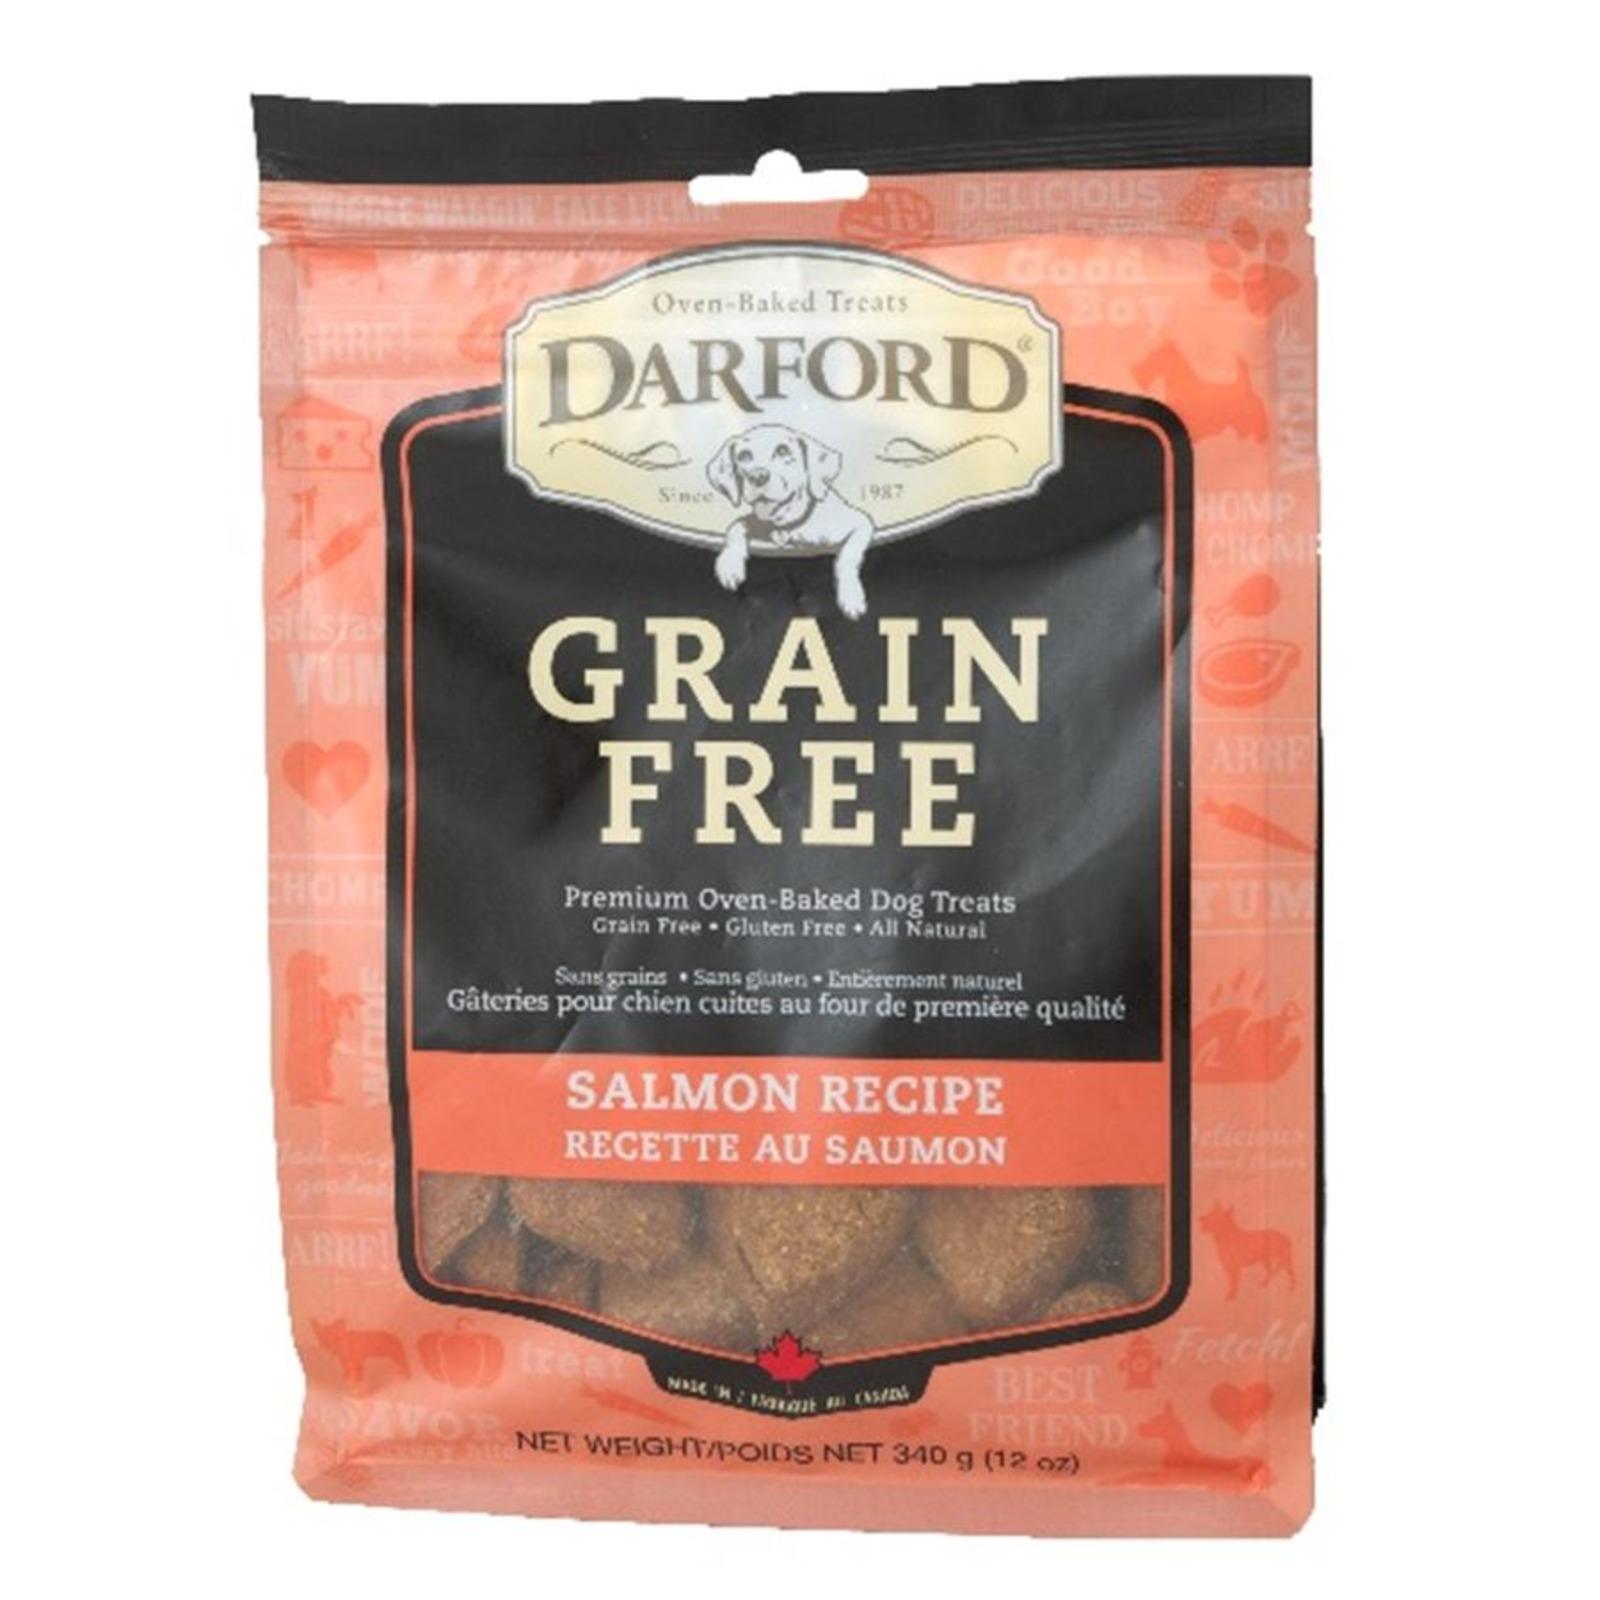 Darford Salmon